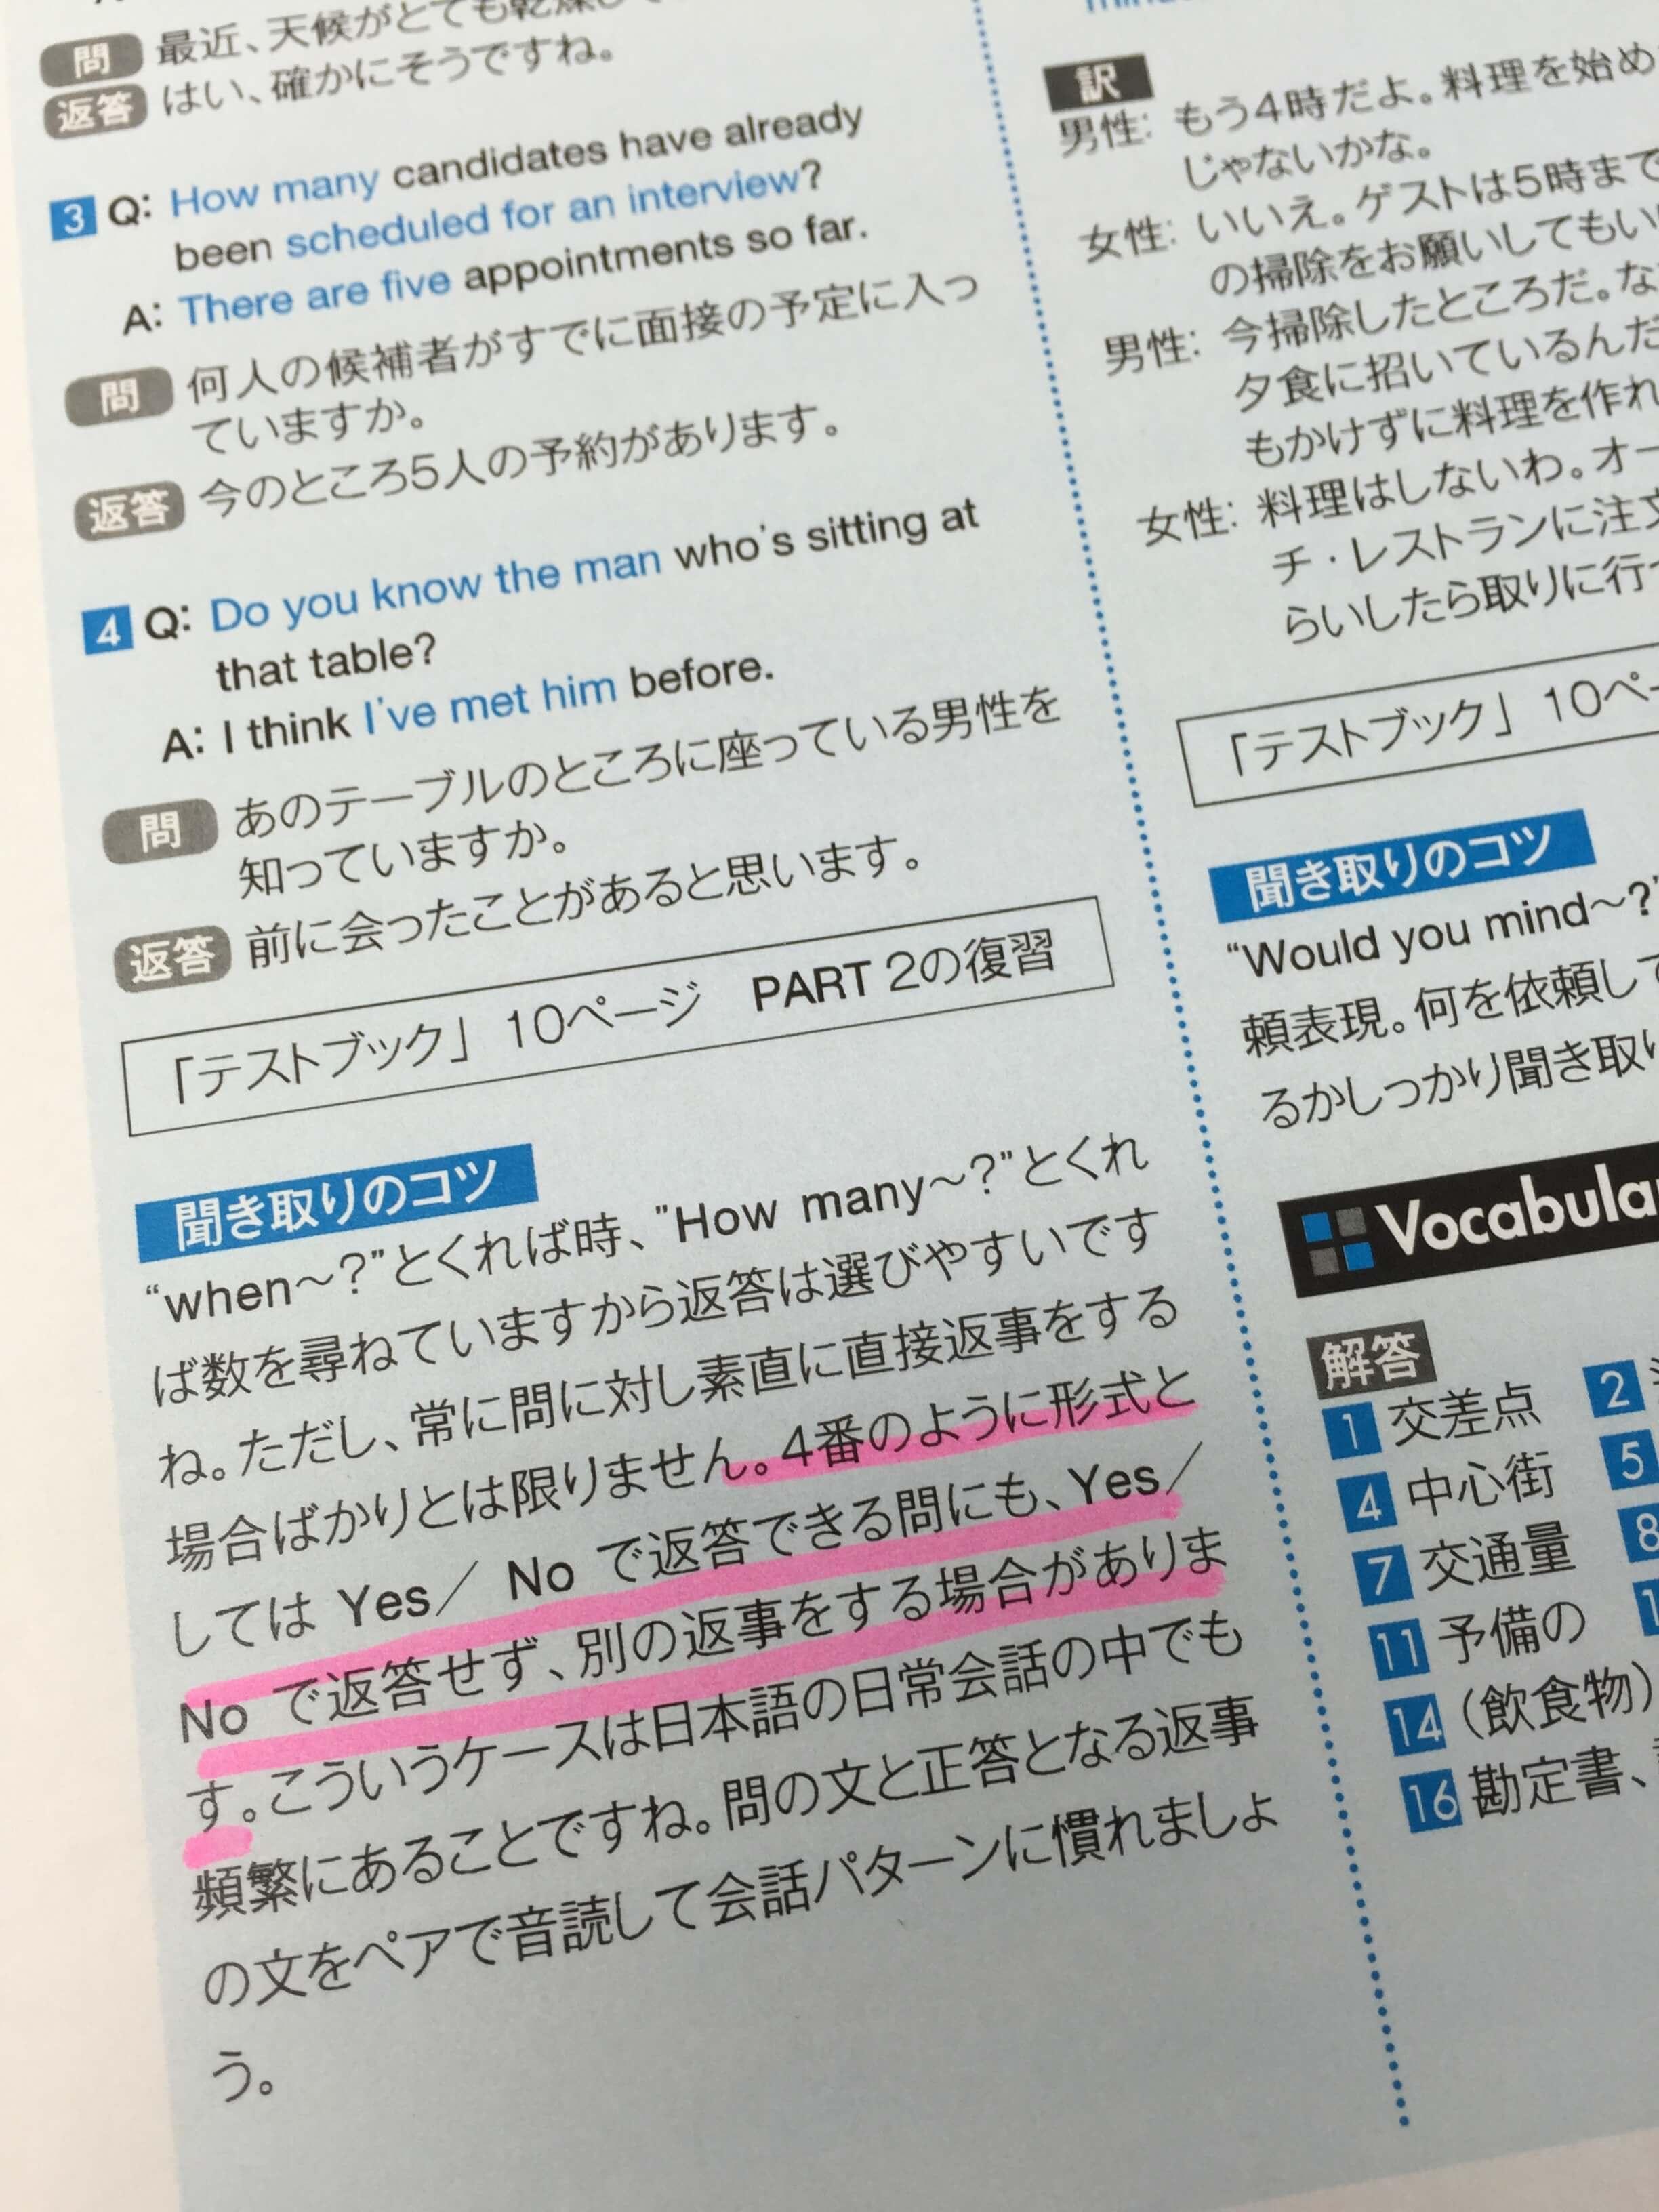 Toeic600 textbook 004